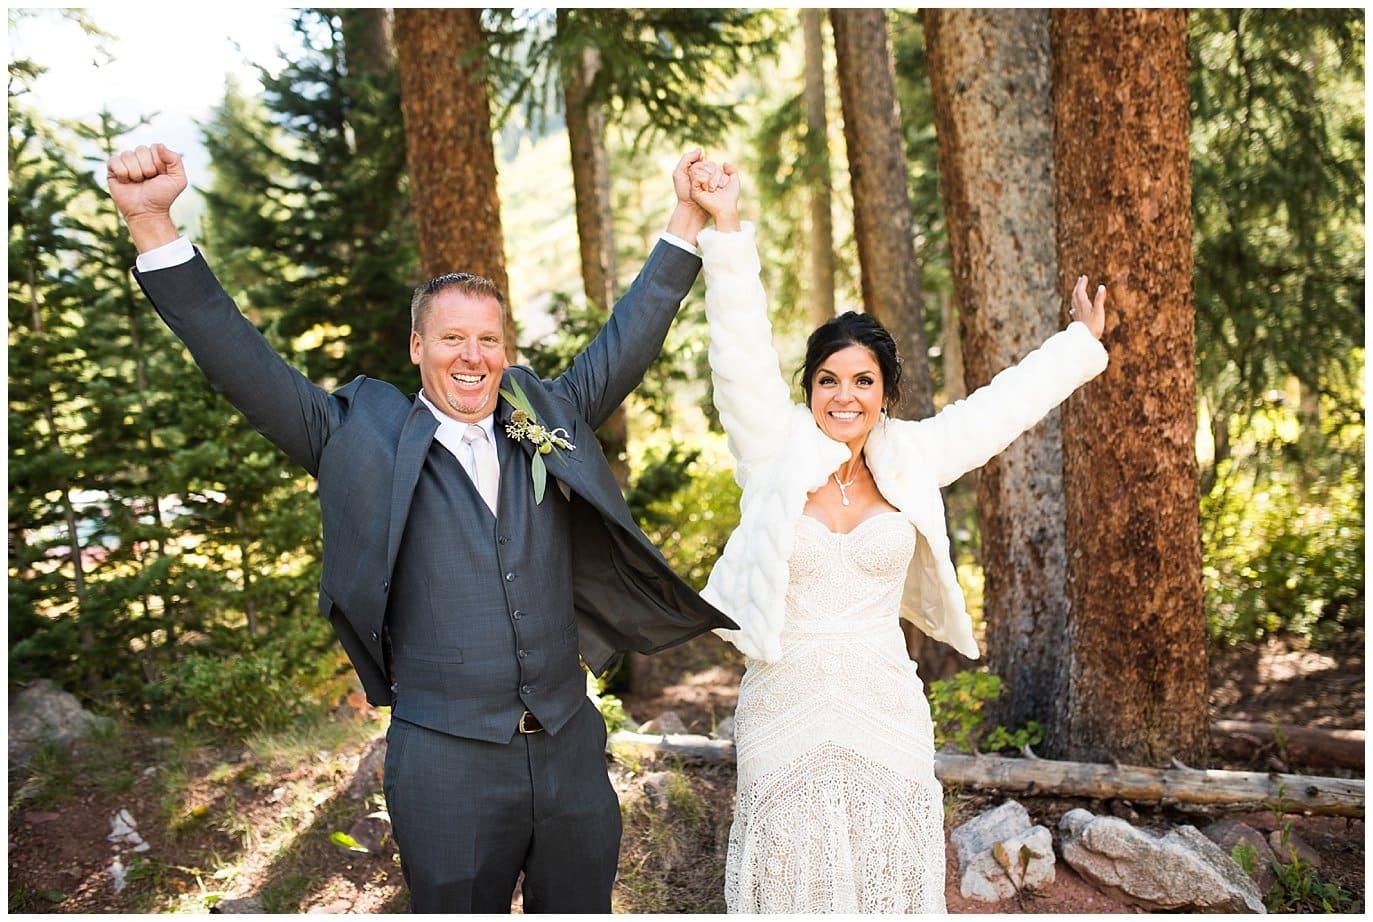 Colorado wedding celebration photo